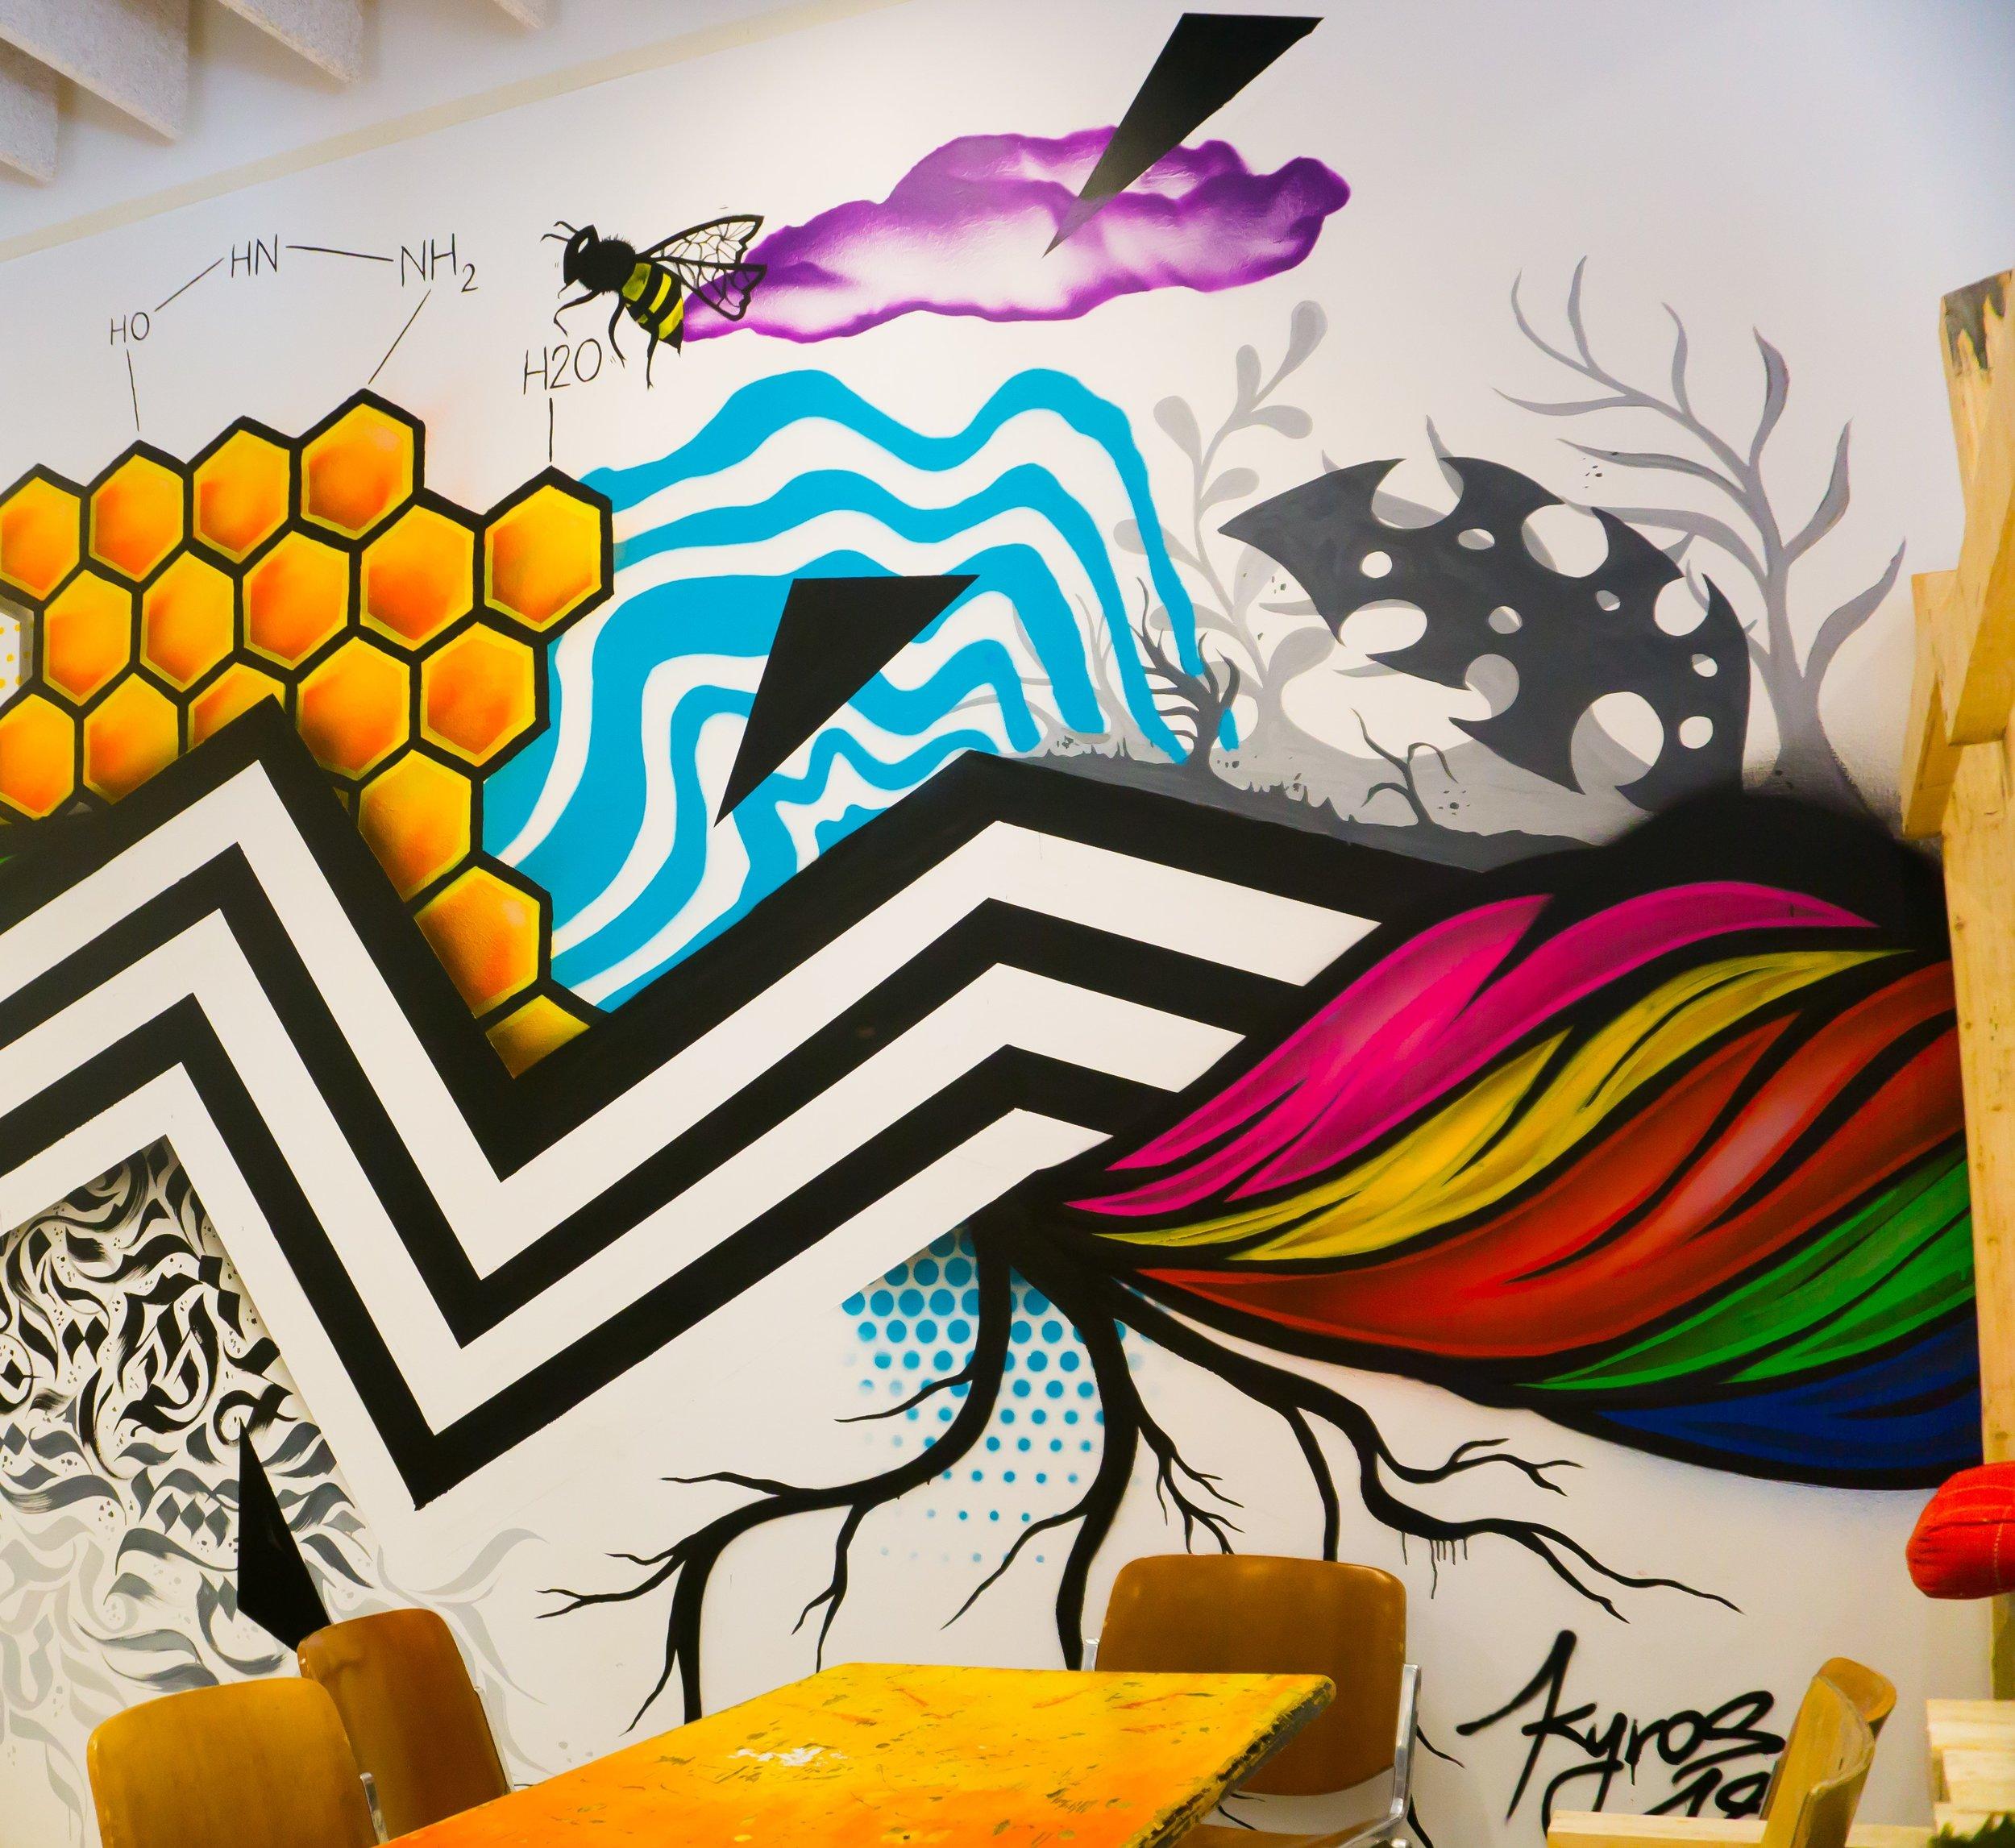 Reisepanorama Unterwegs Mit Reinhard A Sudy Graffiti Street Art